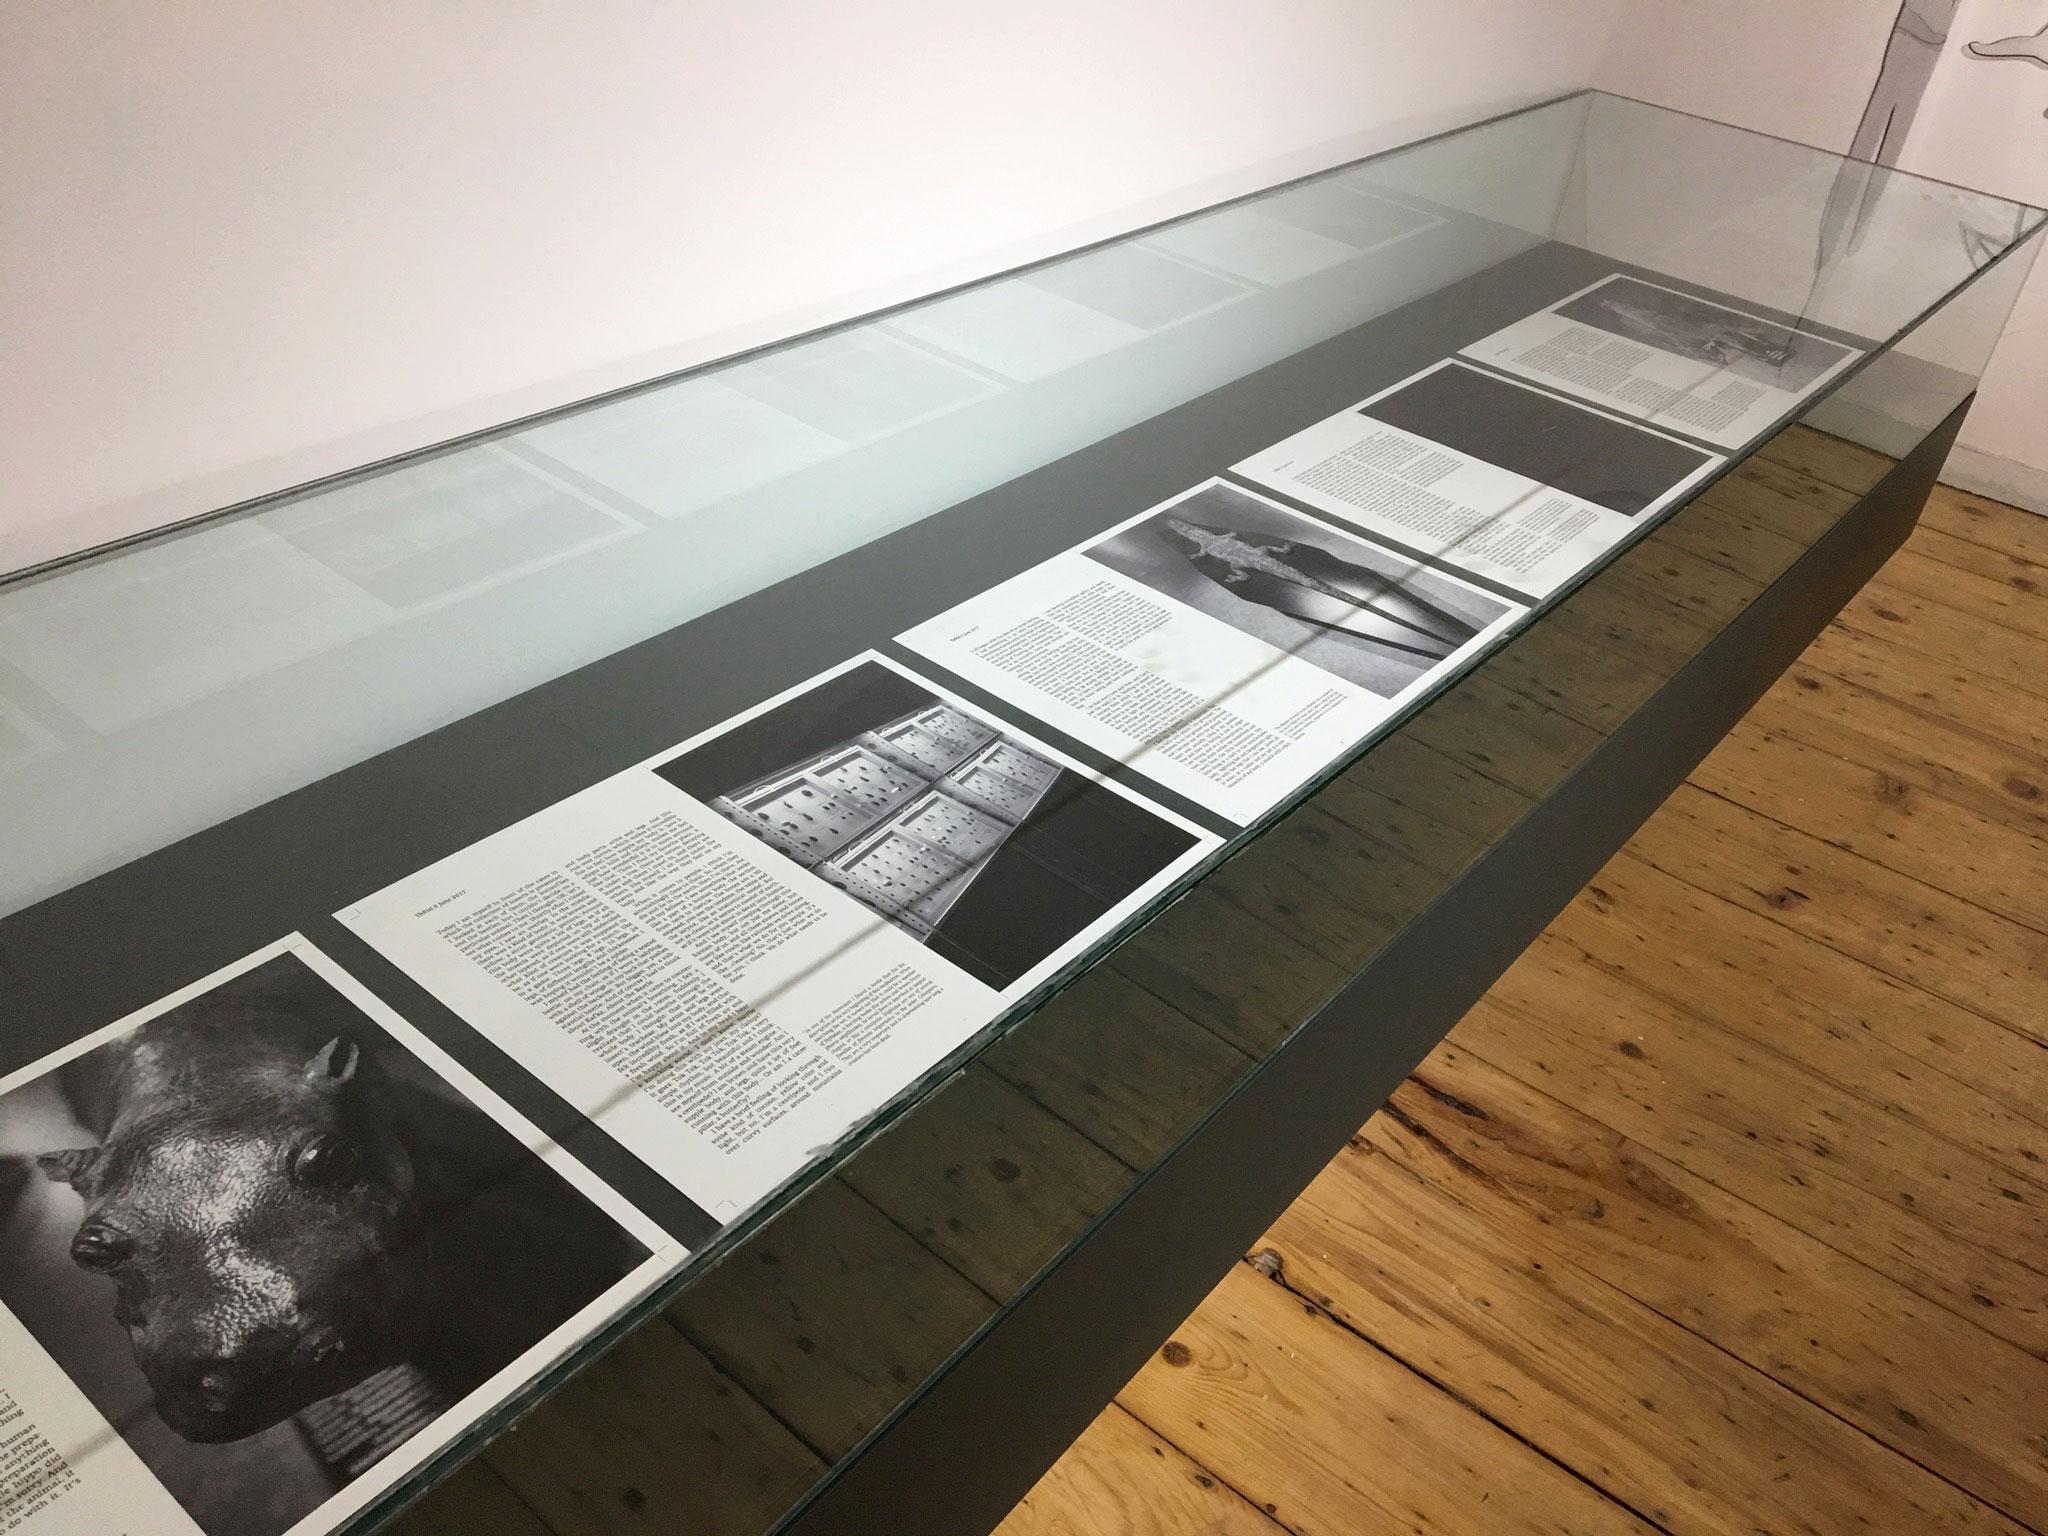 Installation view, TAVIDAN, CCA – Center for Contemporary Art, Tbilisisi